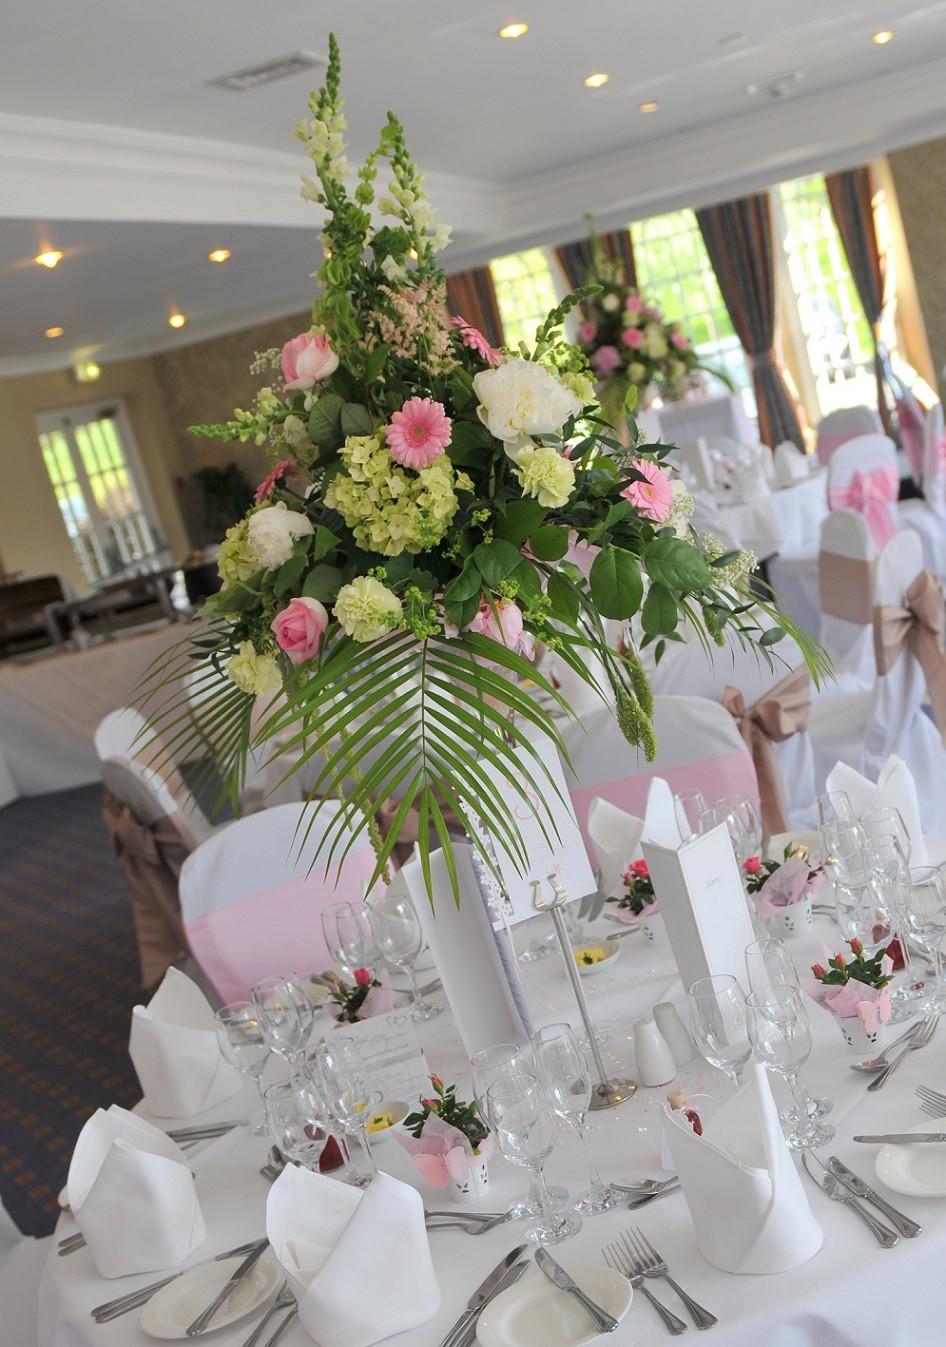 Beautiful wedding venue flowers in yorkshire flower design ripon classic martini glass wedding arrangement reviewsmspy